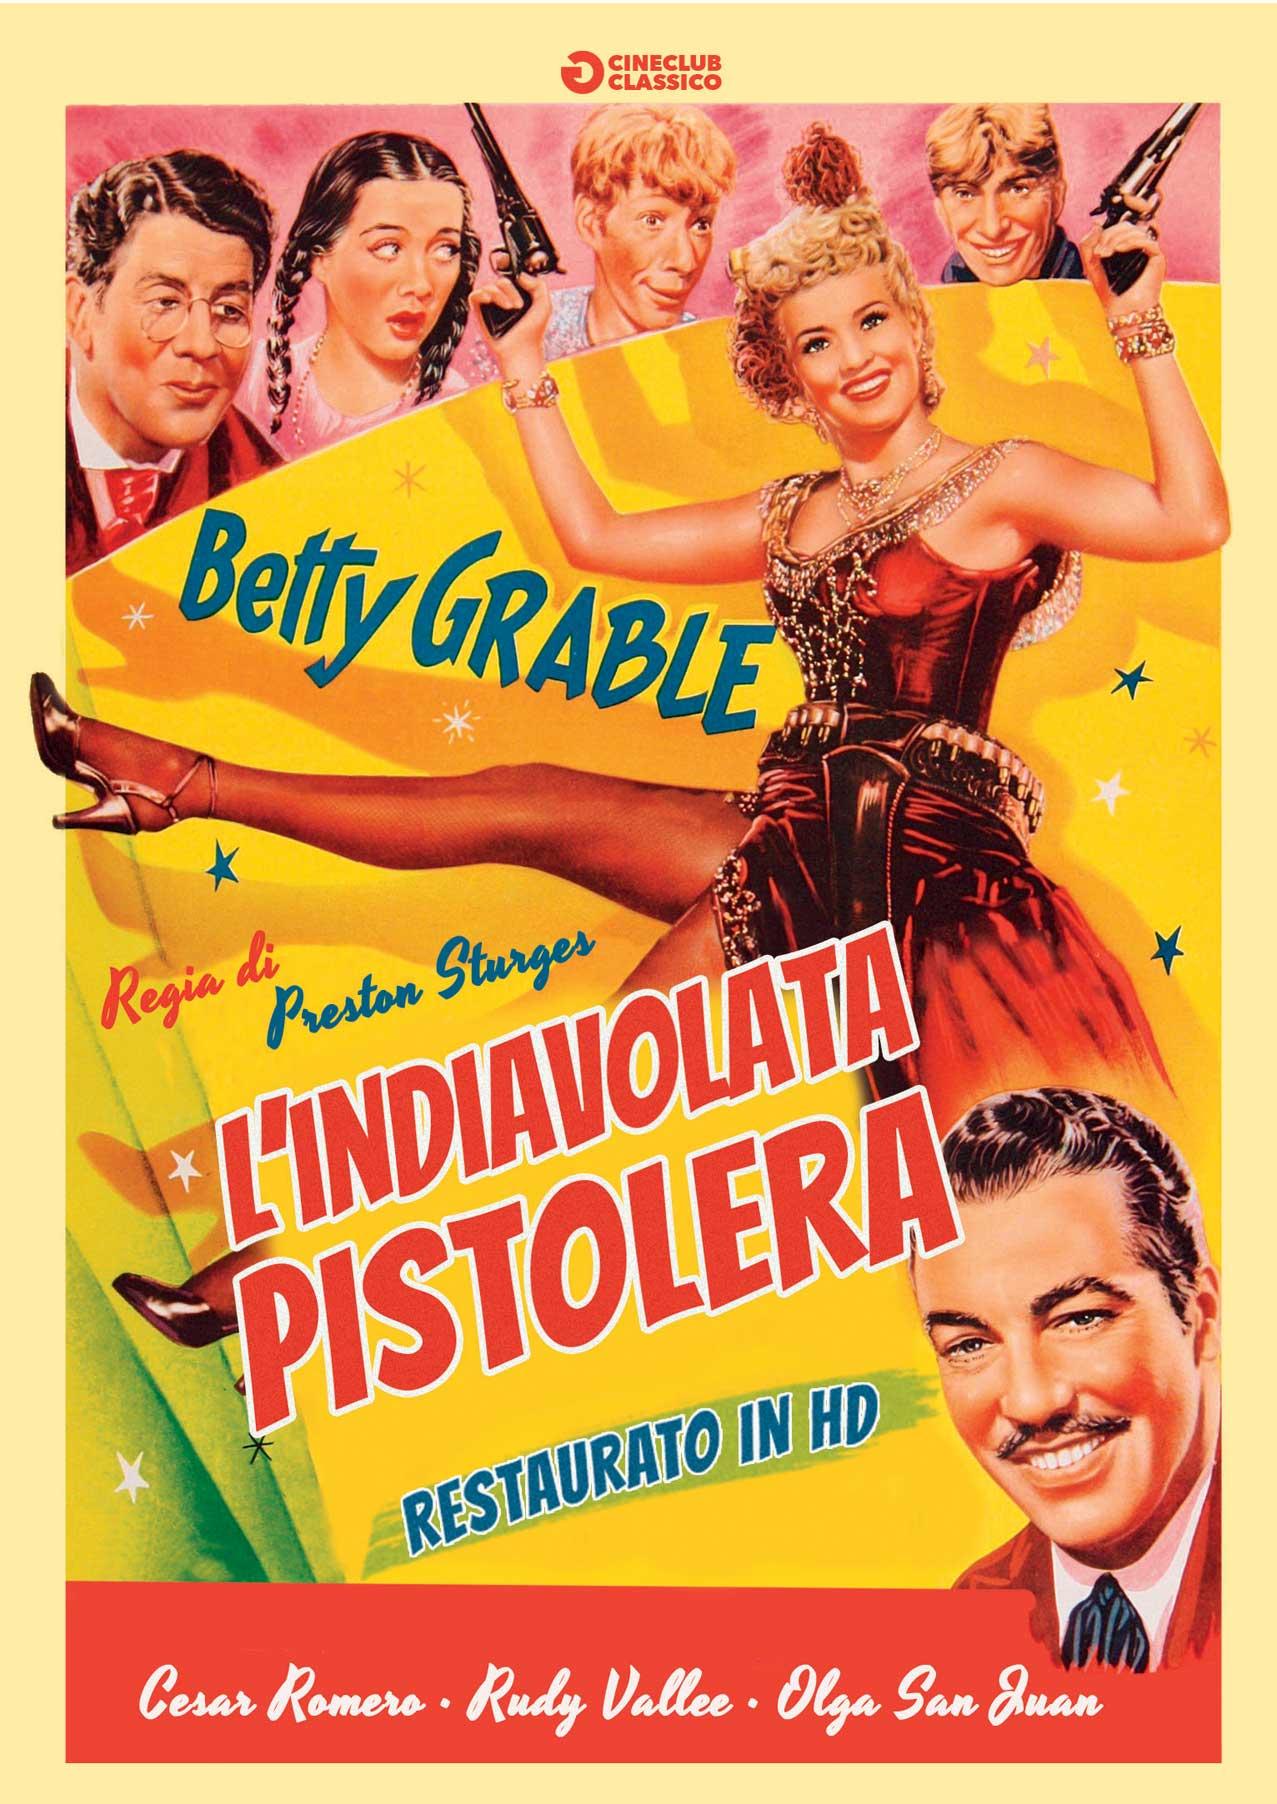 L'INDIAVOLATA PISTOLERA (RESTAURATO IN HD) (DVD)